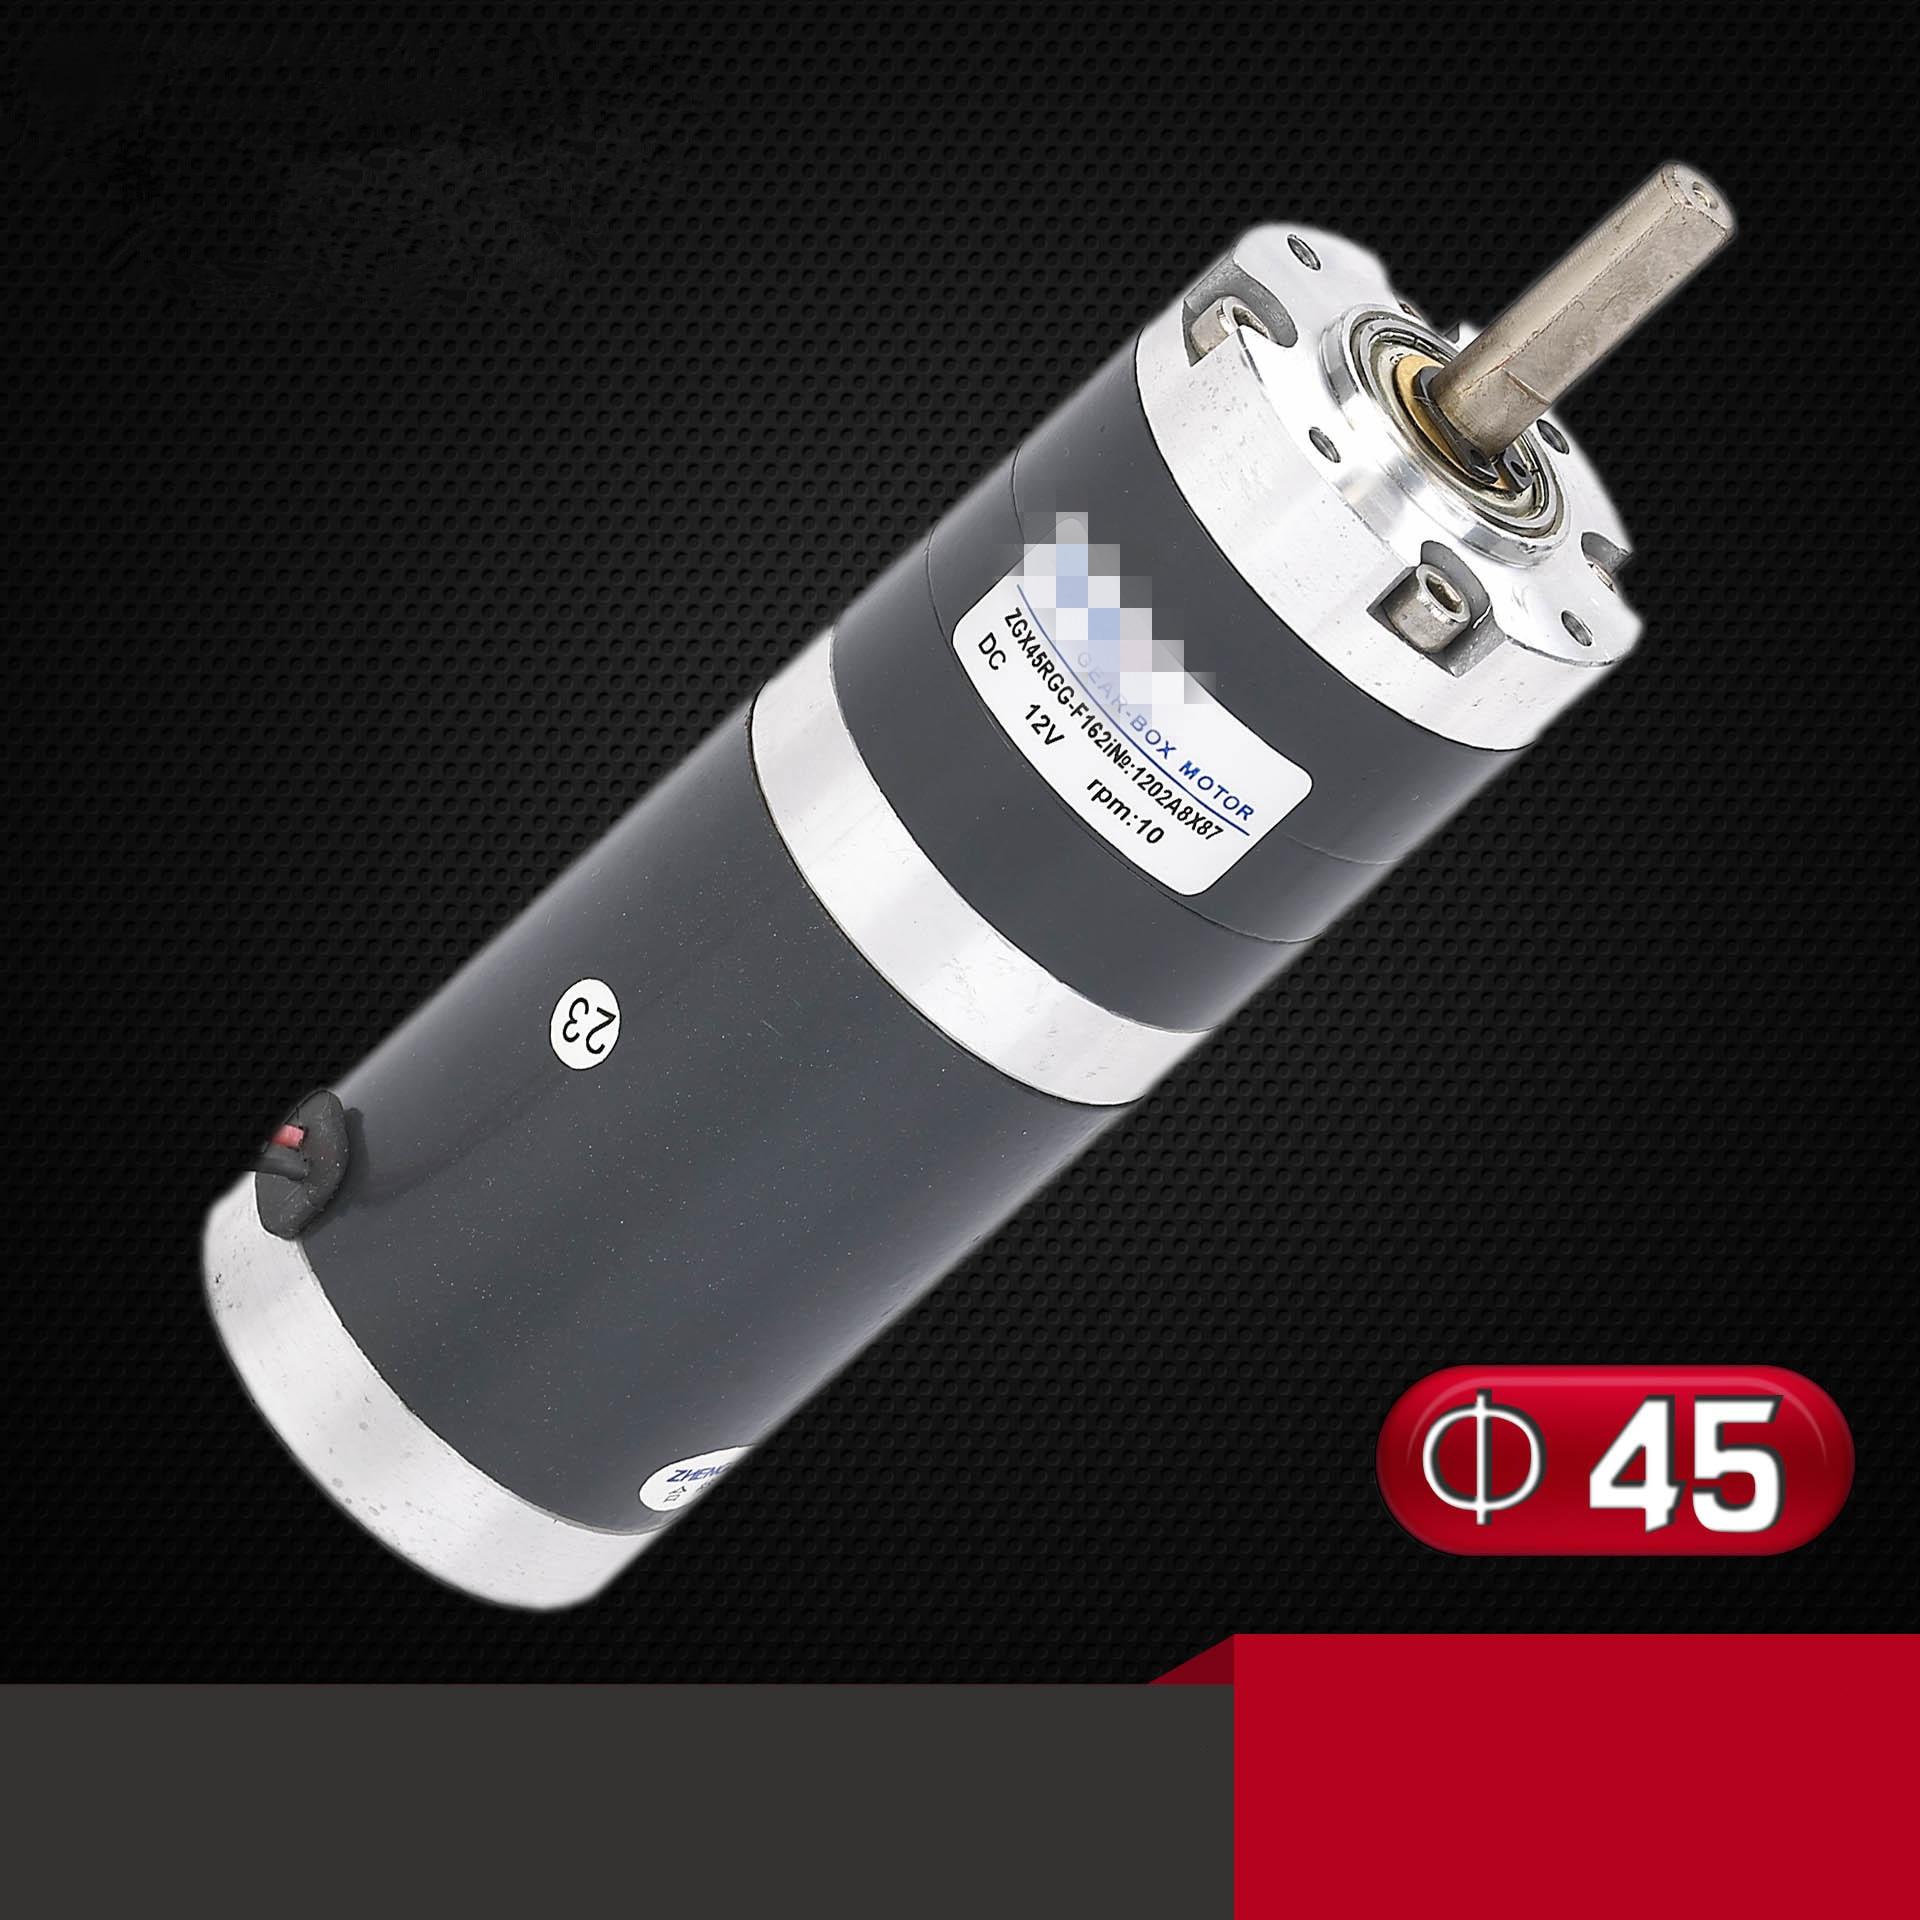 ZGX45RGG DC 12V 24V Permanent Magnet Planetary Gear Motor Brush High Torque 4RPM-800RPM цена